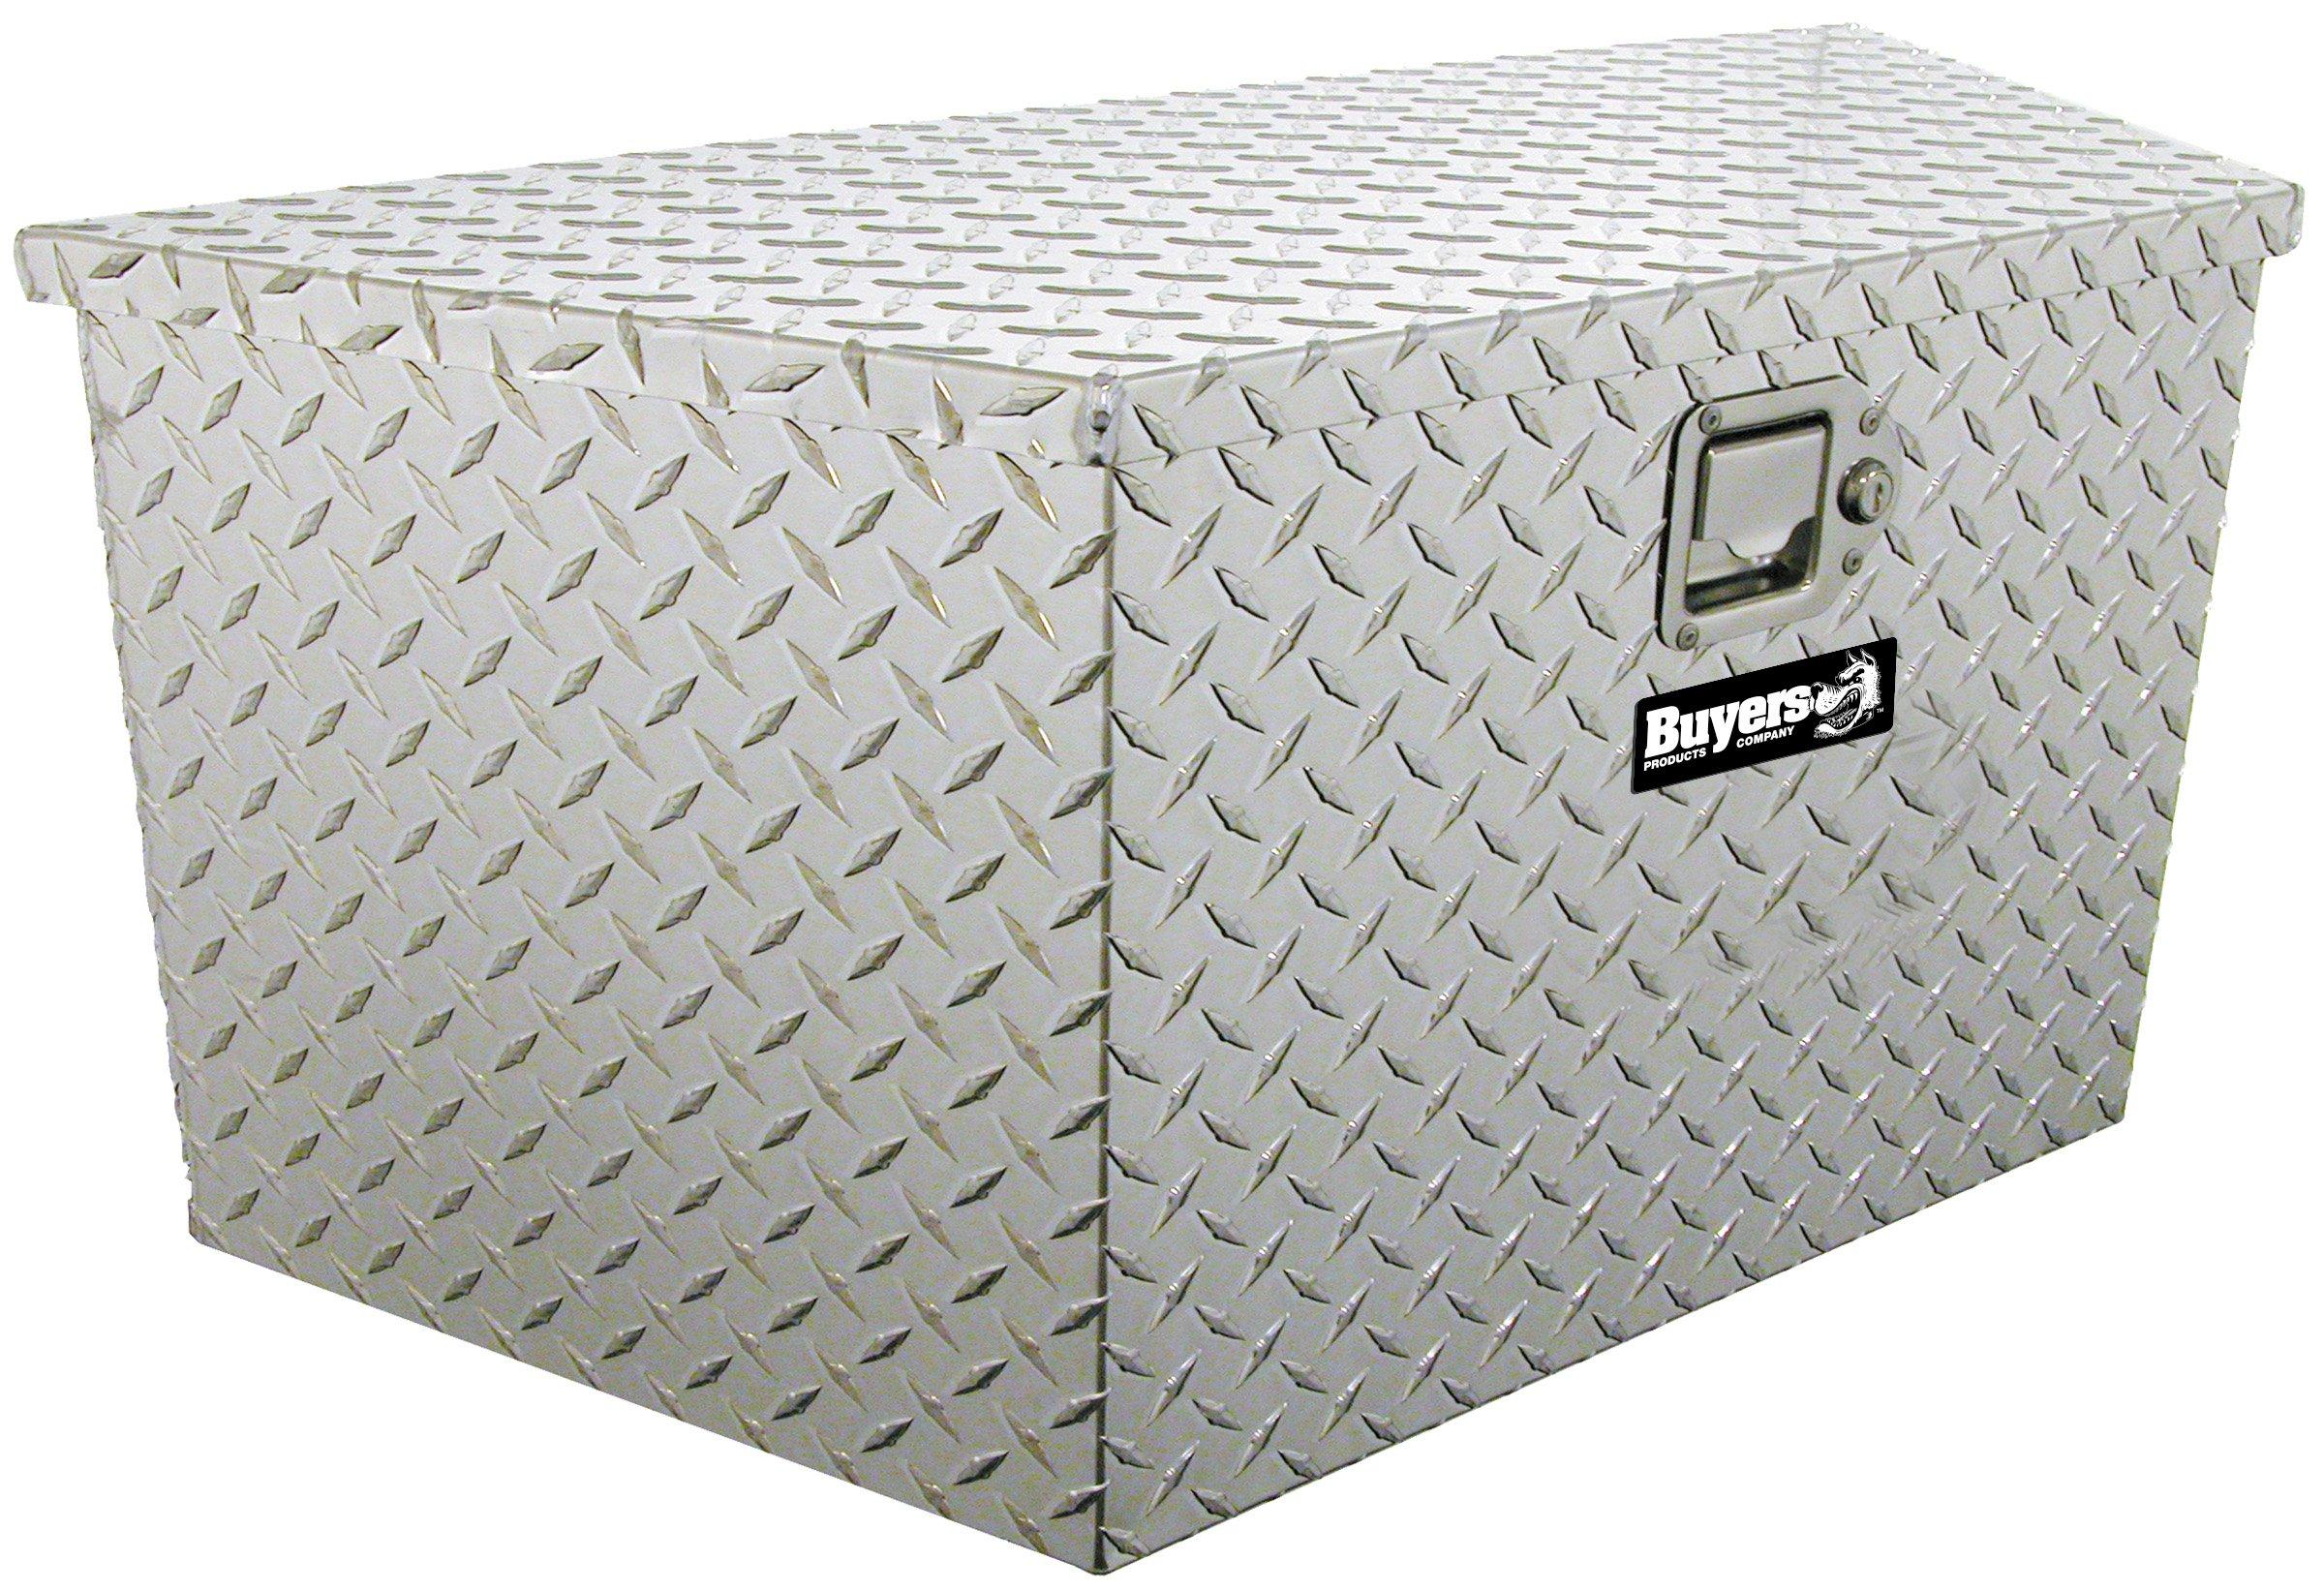 Buyers Products Diamond Tread Aluminum Trailer Tongue Truck Box (18.5x15x49/37 Inch)